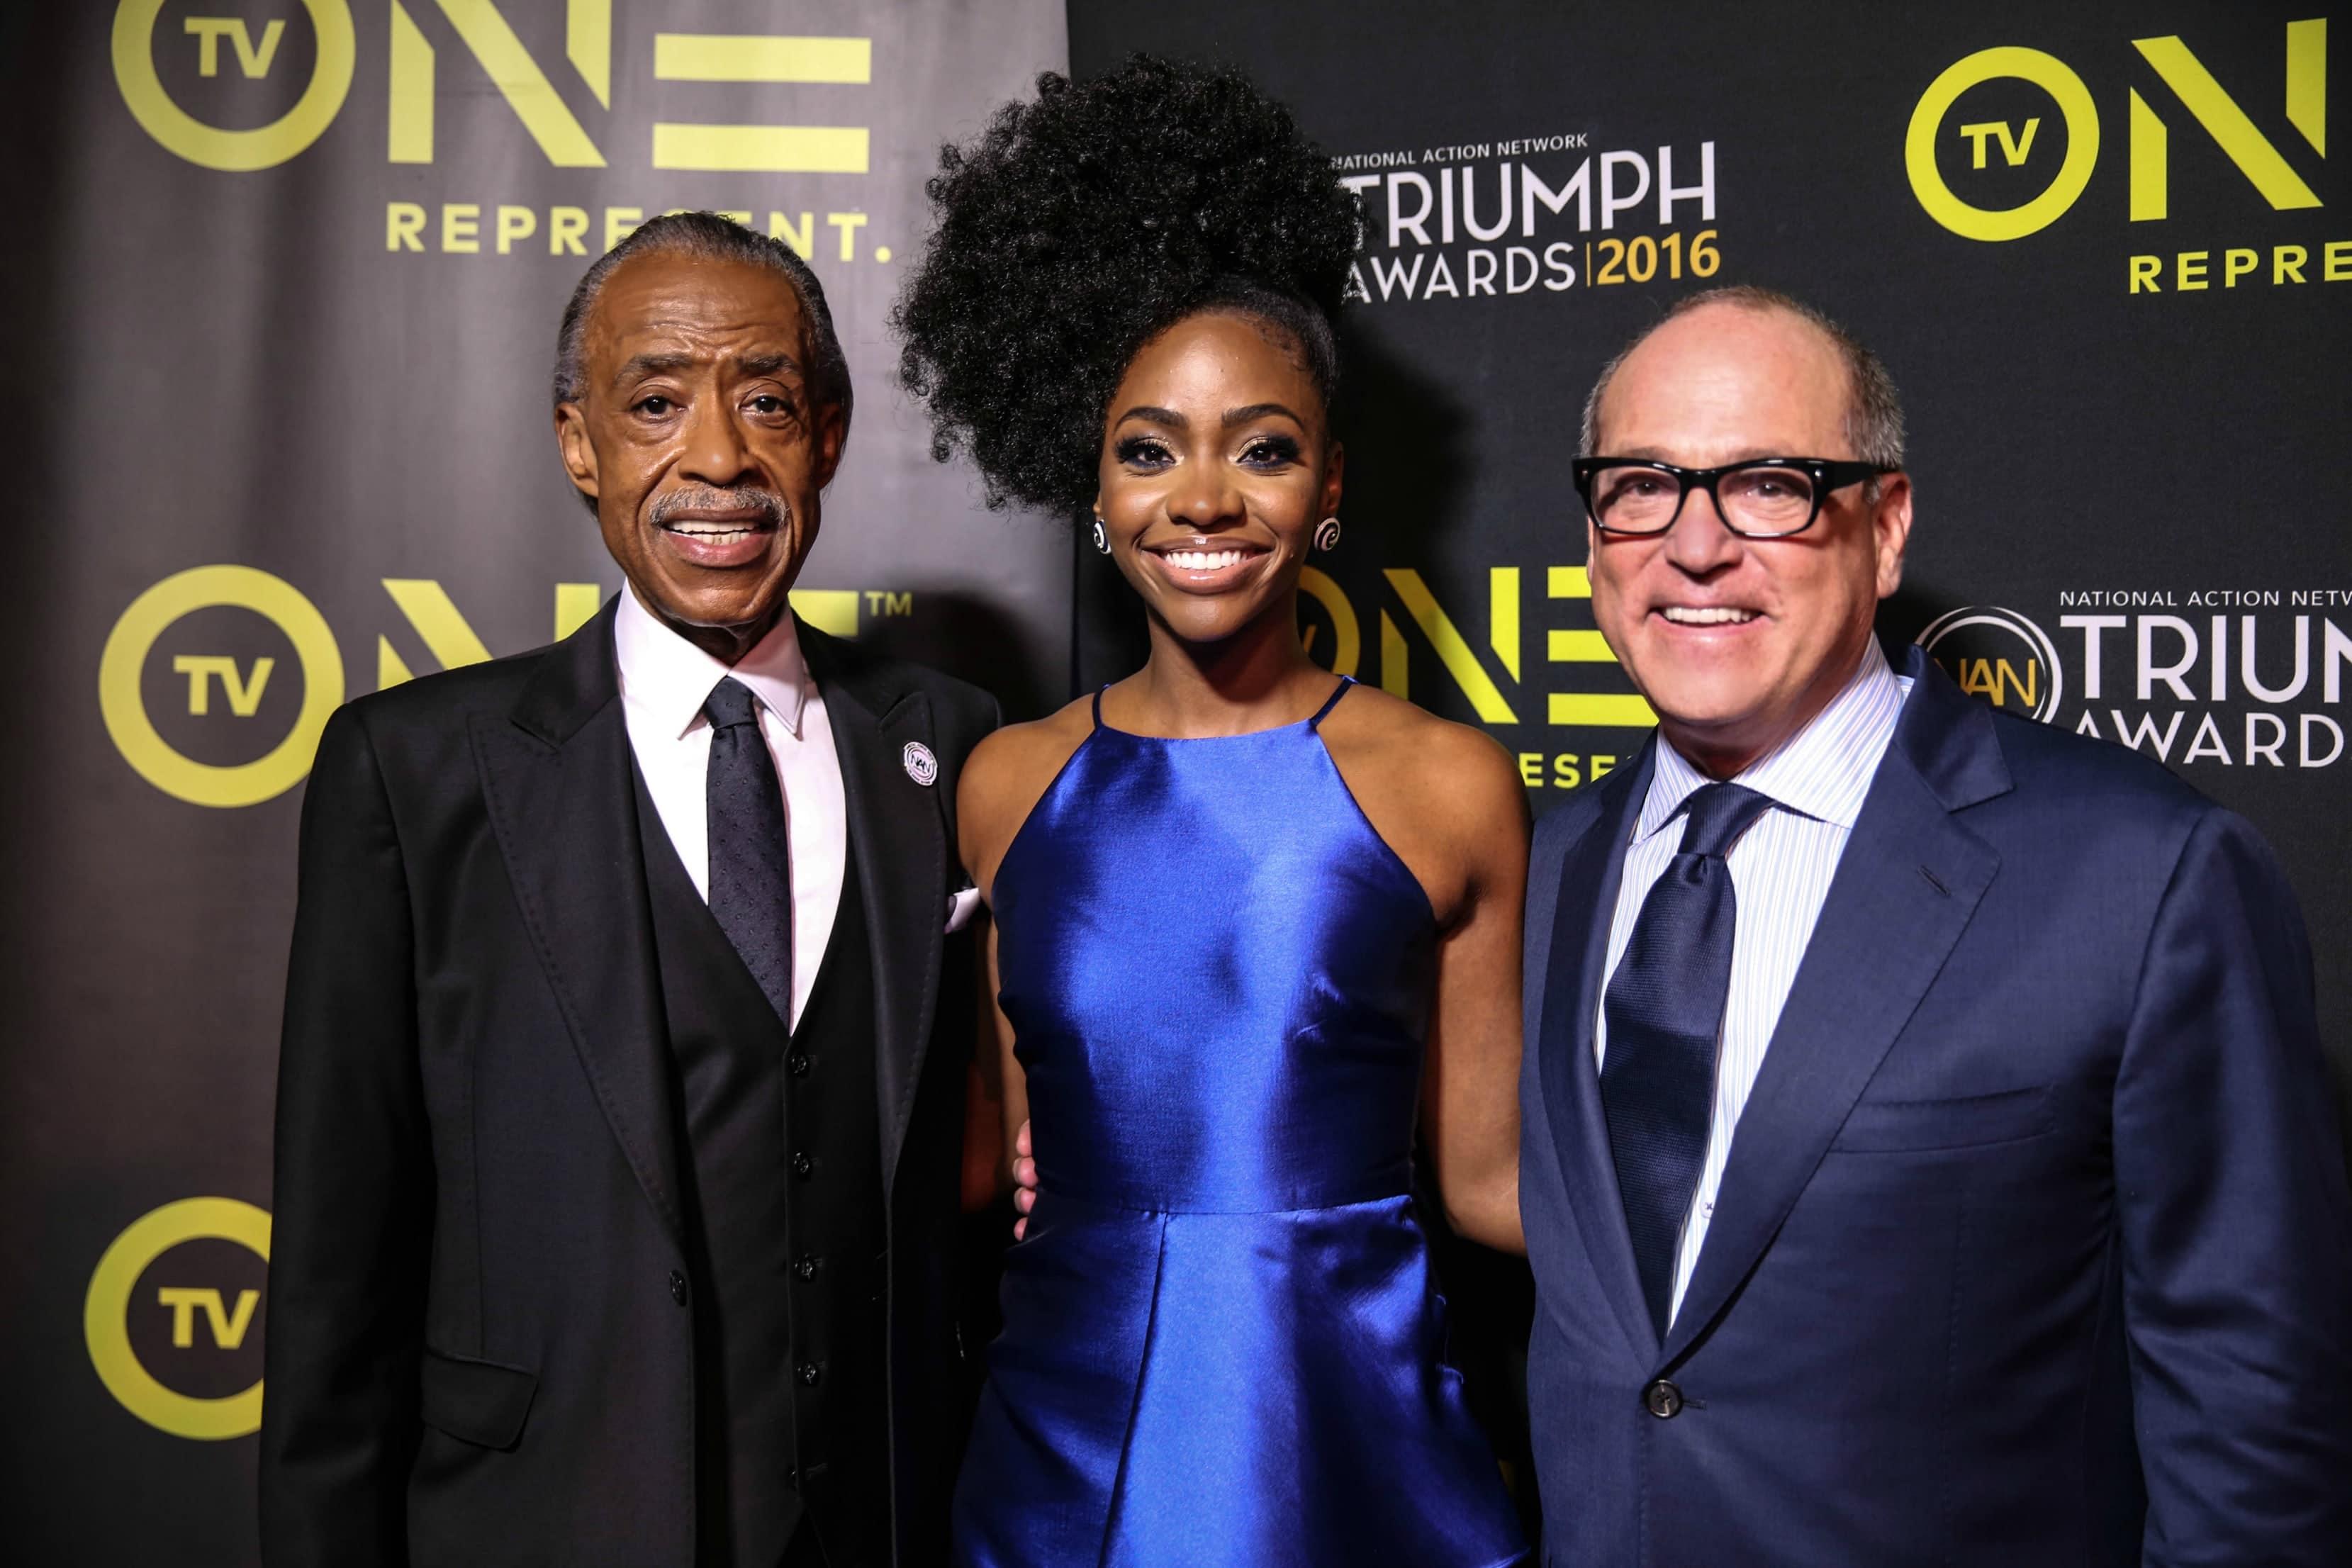 The 2016 Triumph Awards: Rev Al Sharpton, Teyonah Parris and Brad Siegel (photo credit: Robin Marshall)